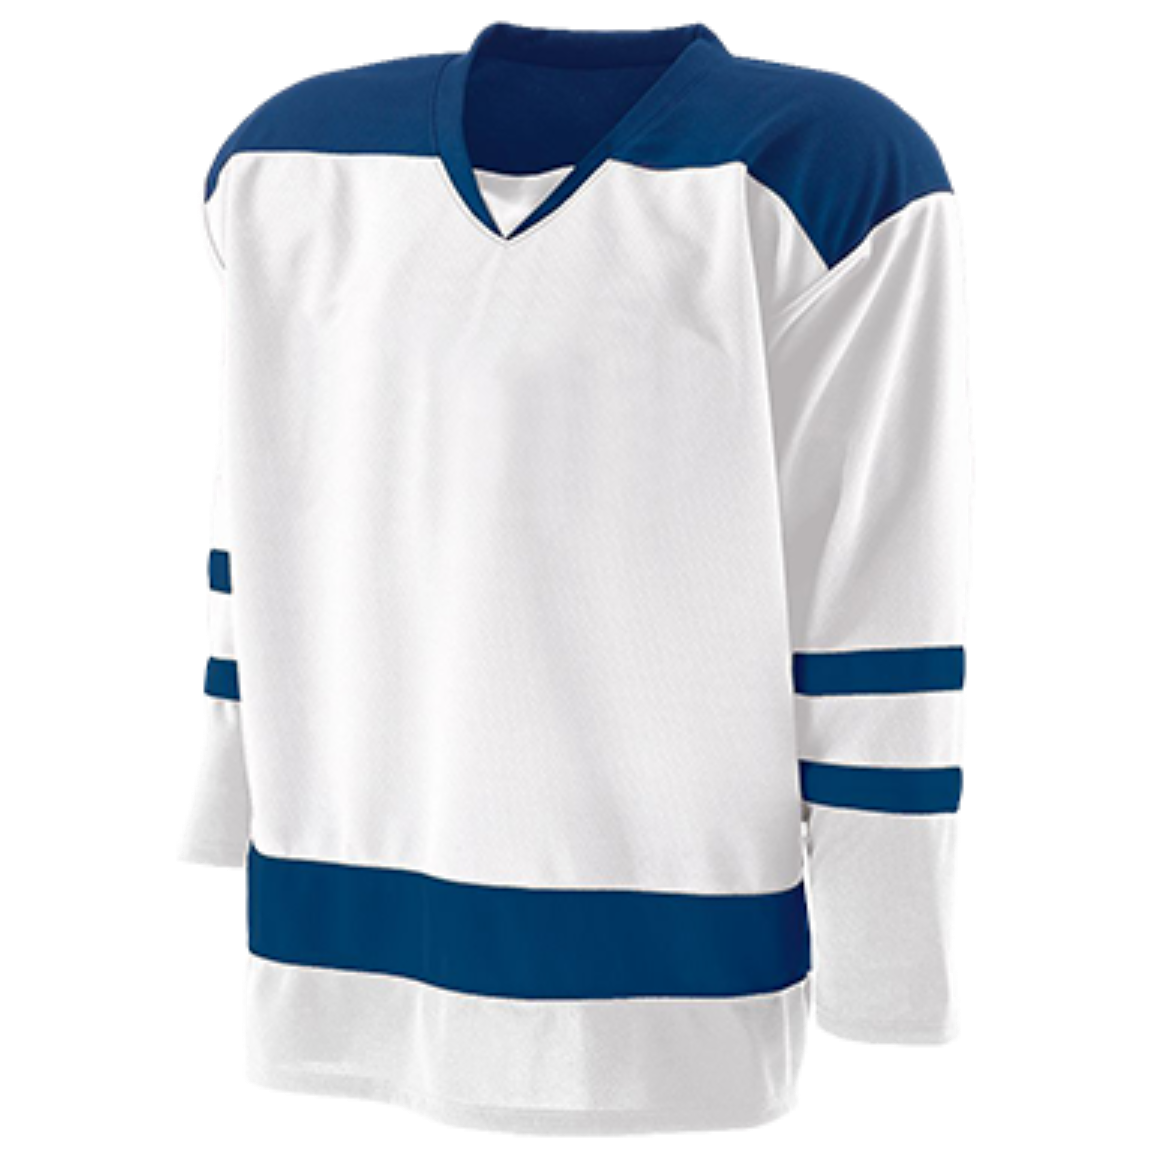 9ee26542f50 Grace Wilday Middle School Youth Hockey Goalie Jersey - SpiritShop.com